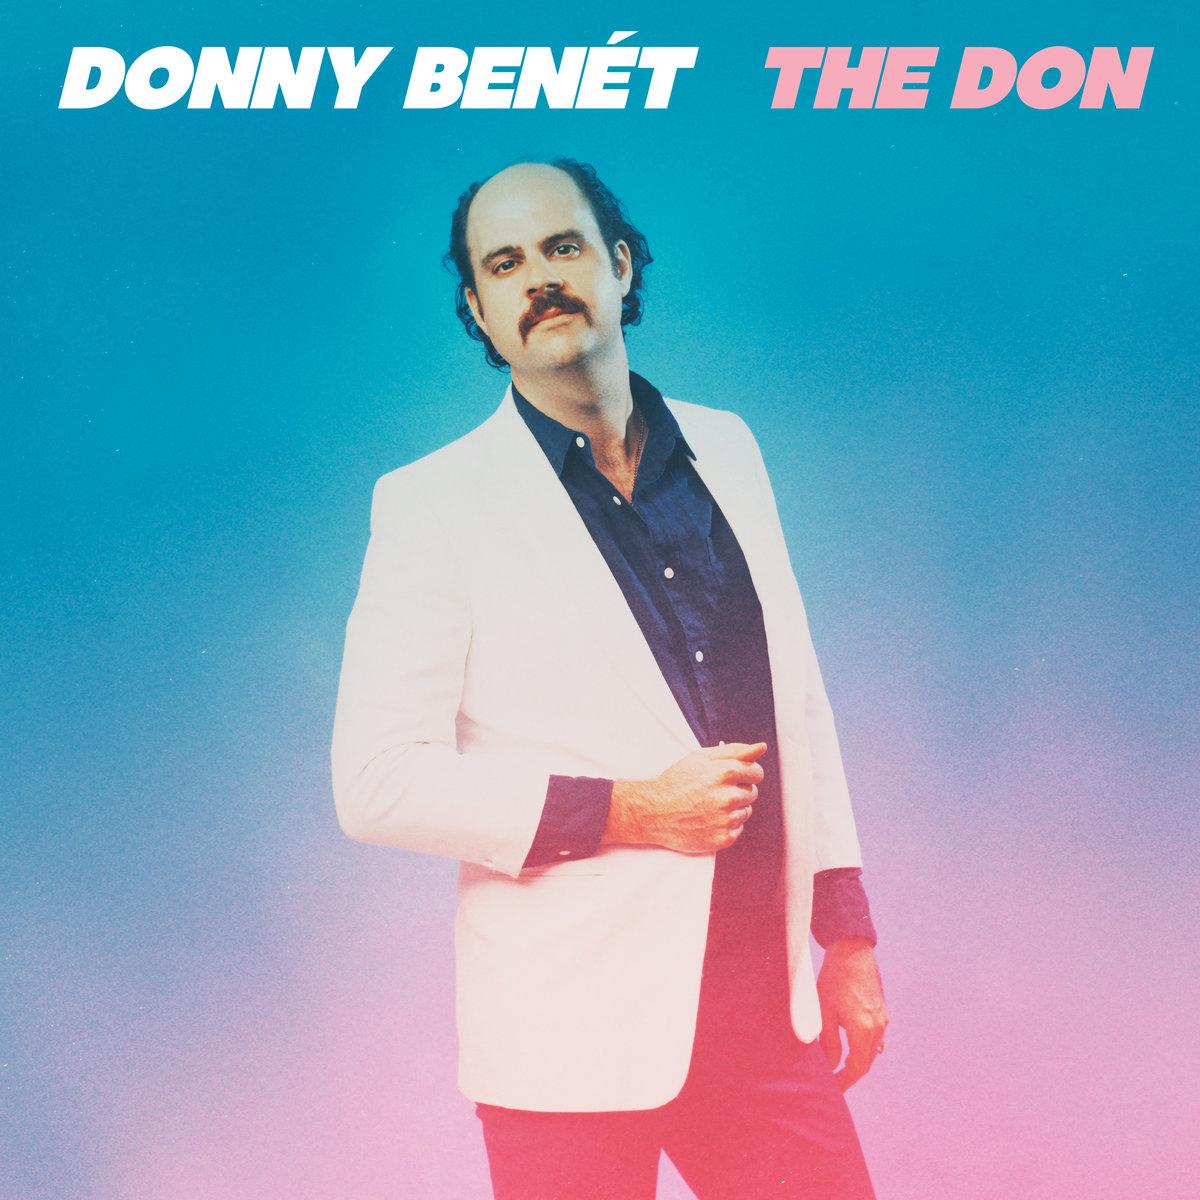 Donny Benét – The Don